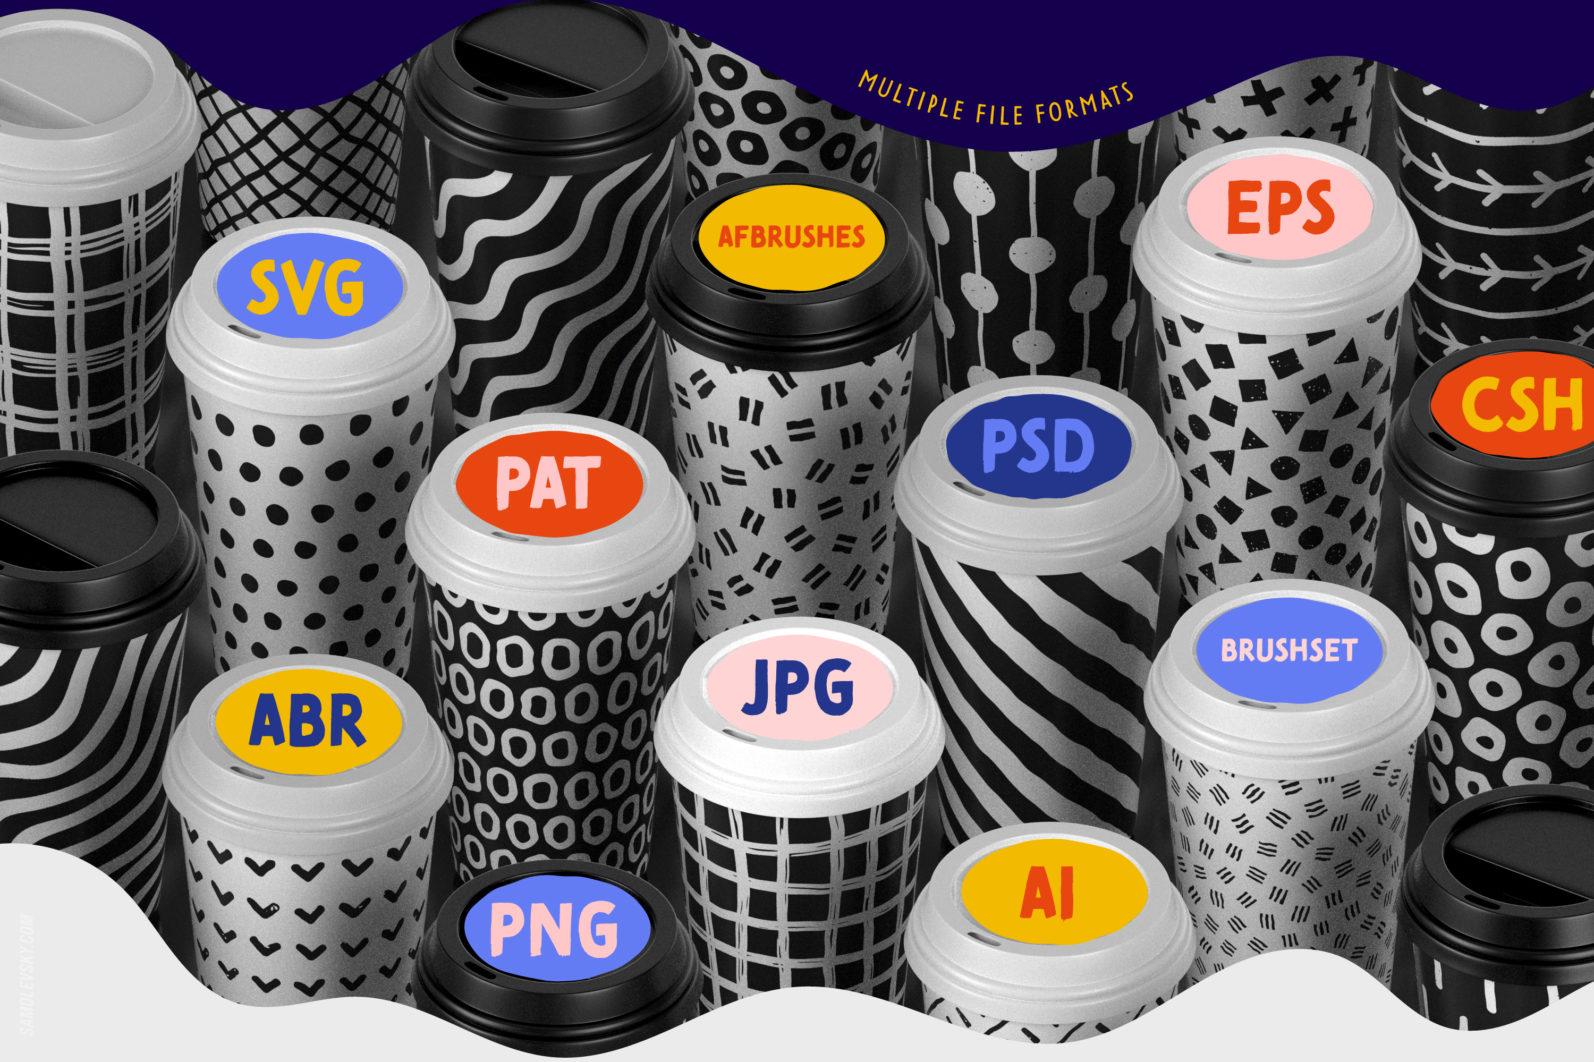 Handmade patterns bundle - 300 seamless patterns, brushes, and shapes - Samolevsky.com Handmade patterns bundle 21 scaled -